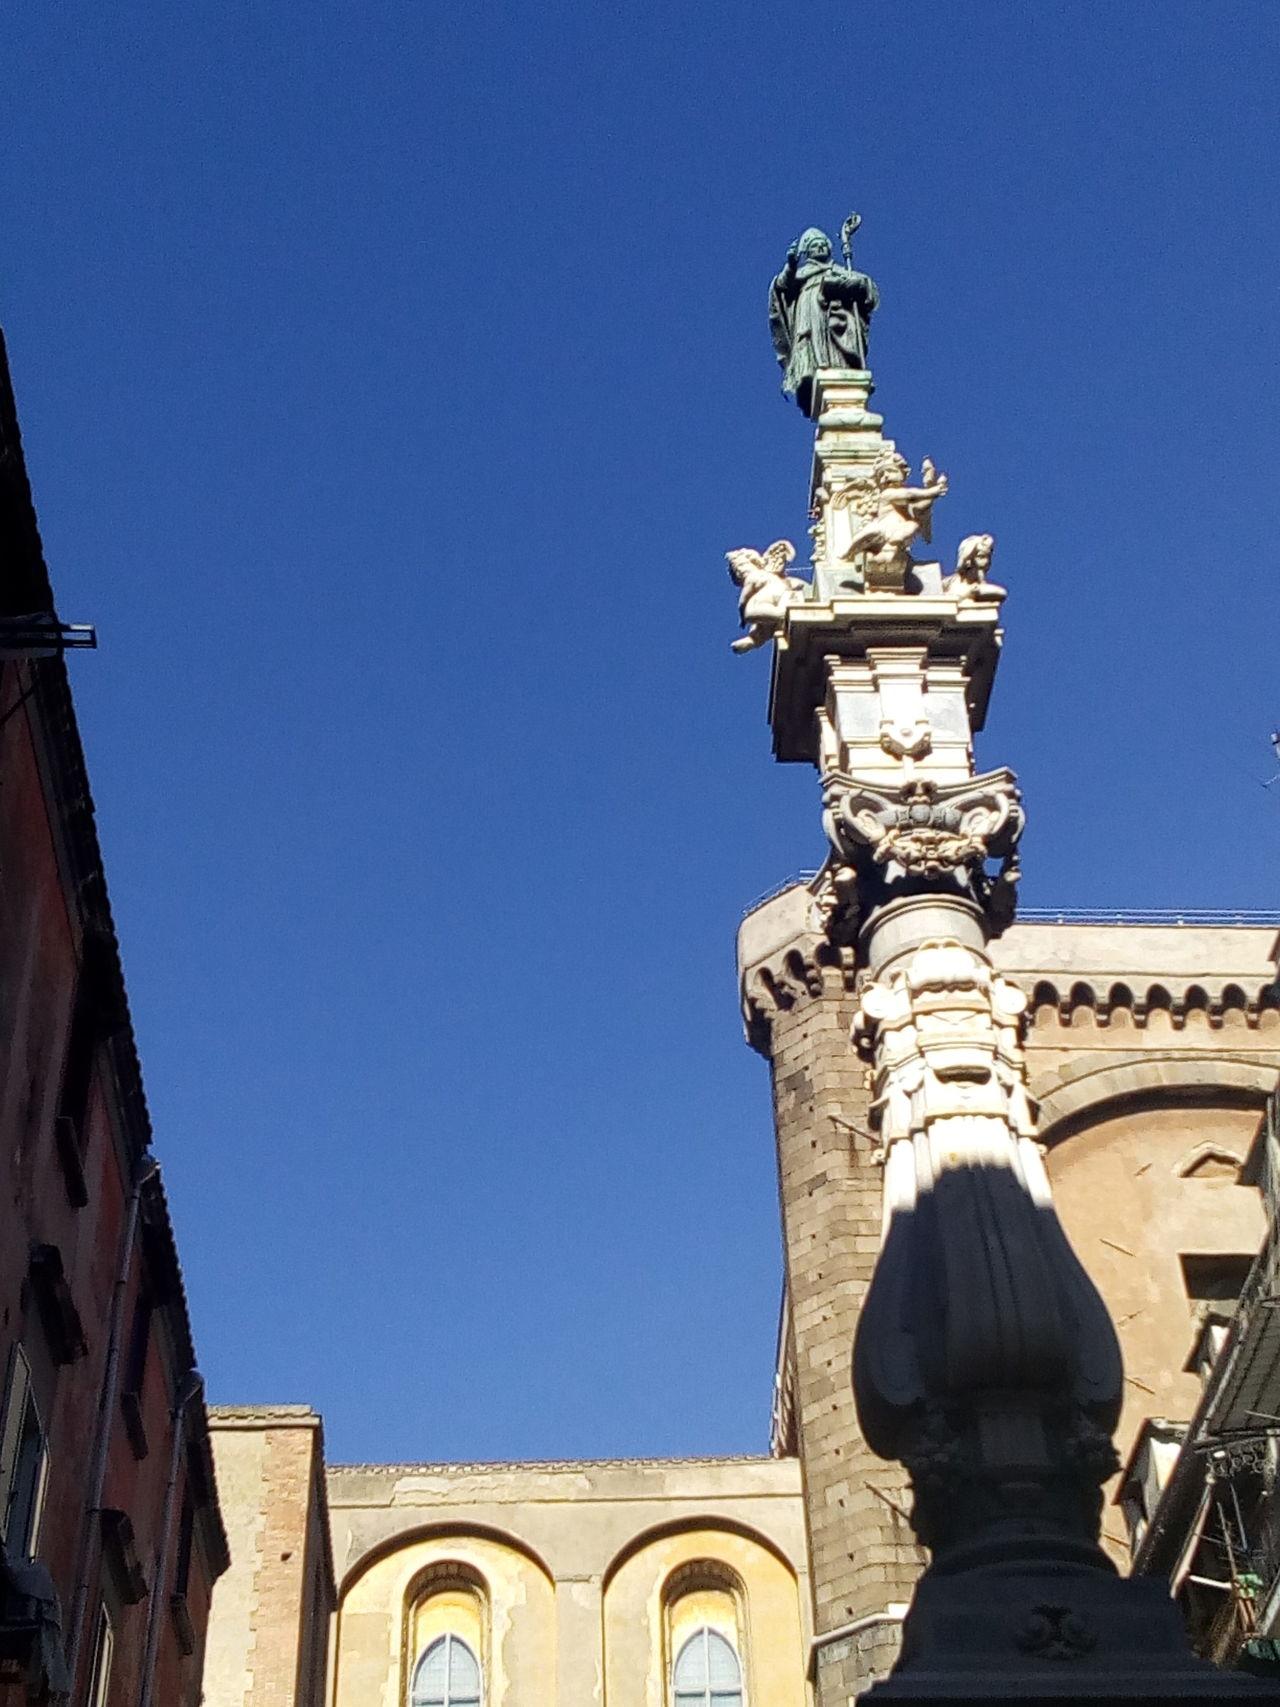 Architecture Building Exterior Church Church Famous Place History Napoli Obelisk Place Of Worship Religion Saint Statue San Gennaro Spirituality Square Via Dei Tribunali